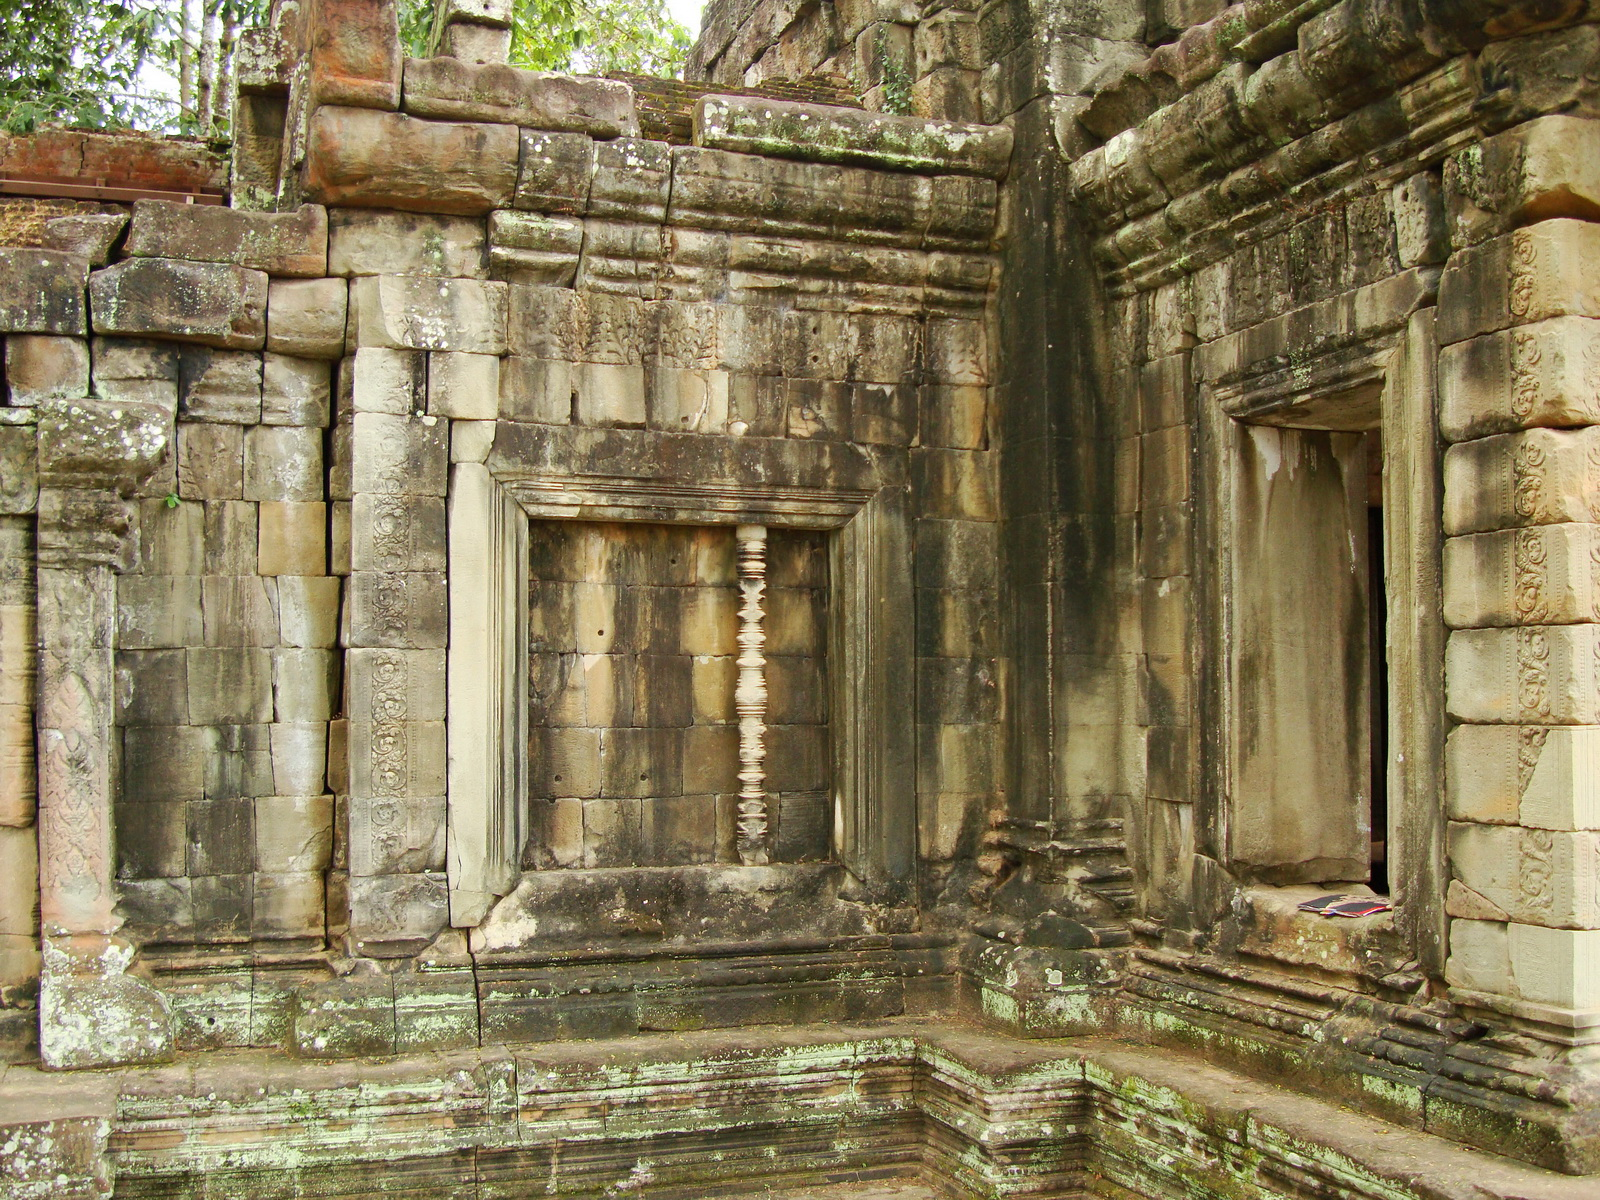 Terrace of the Elephants inner gate Angkor Thom 08